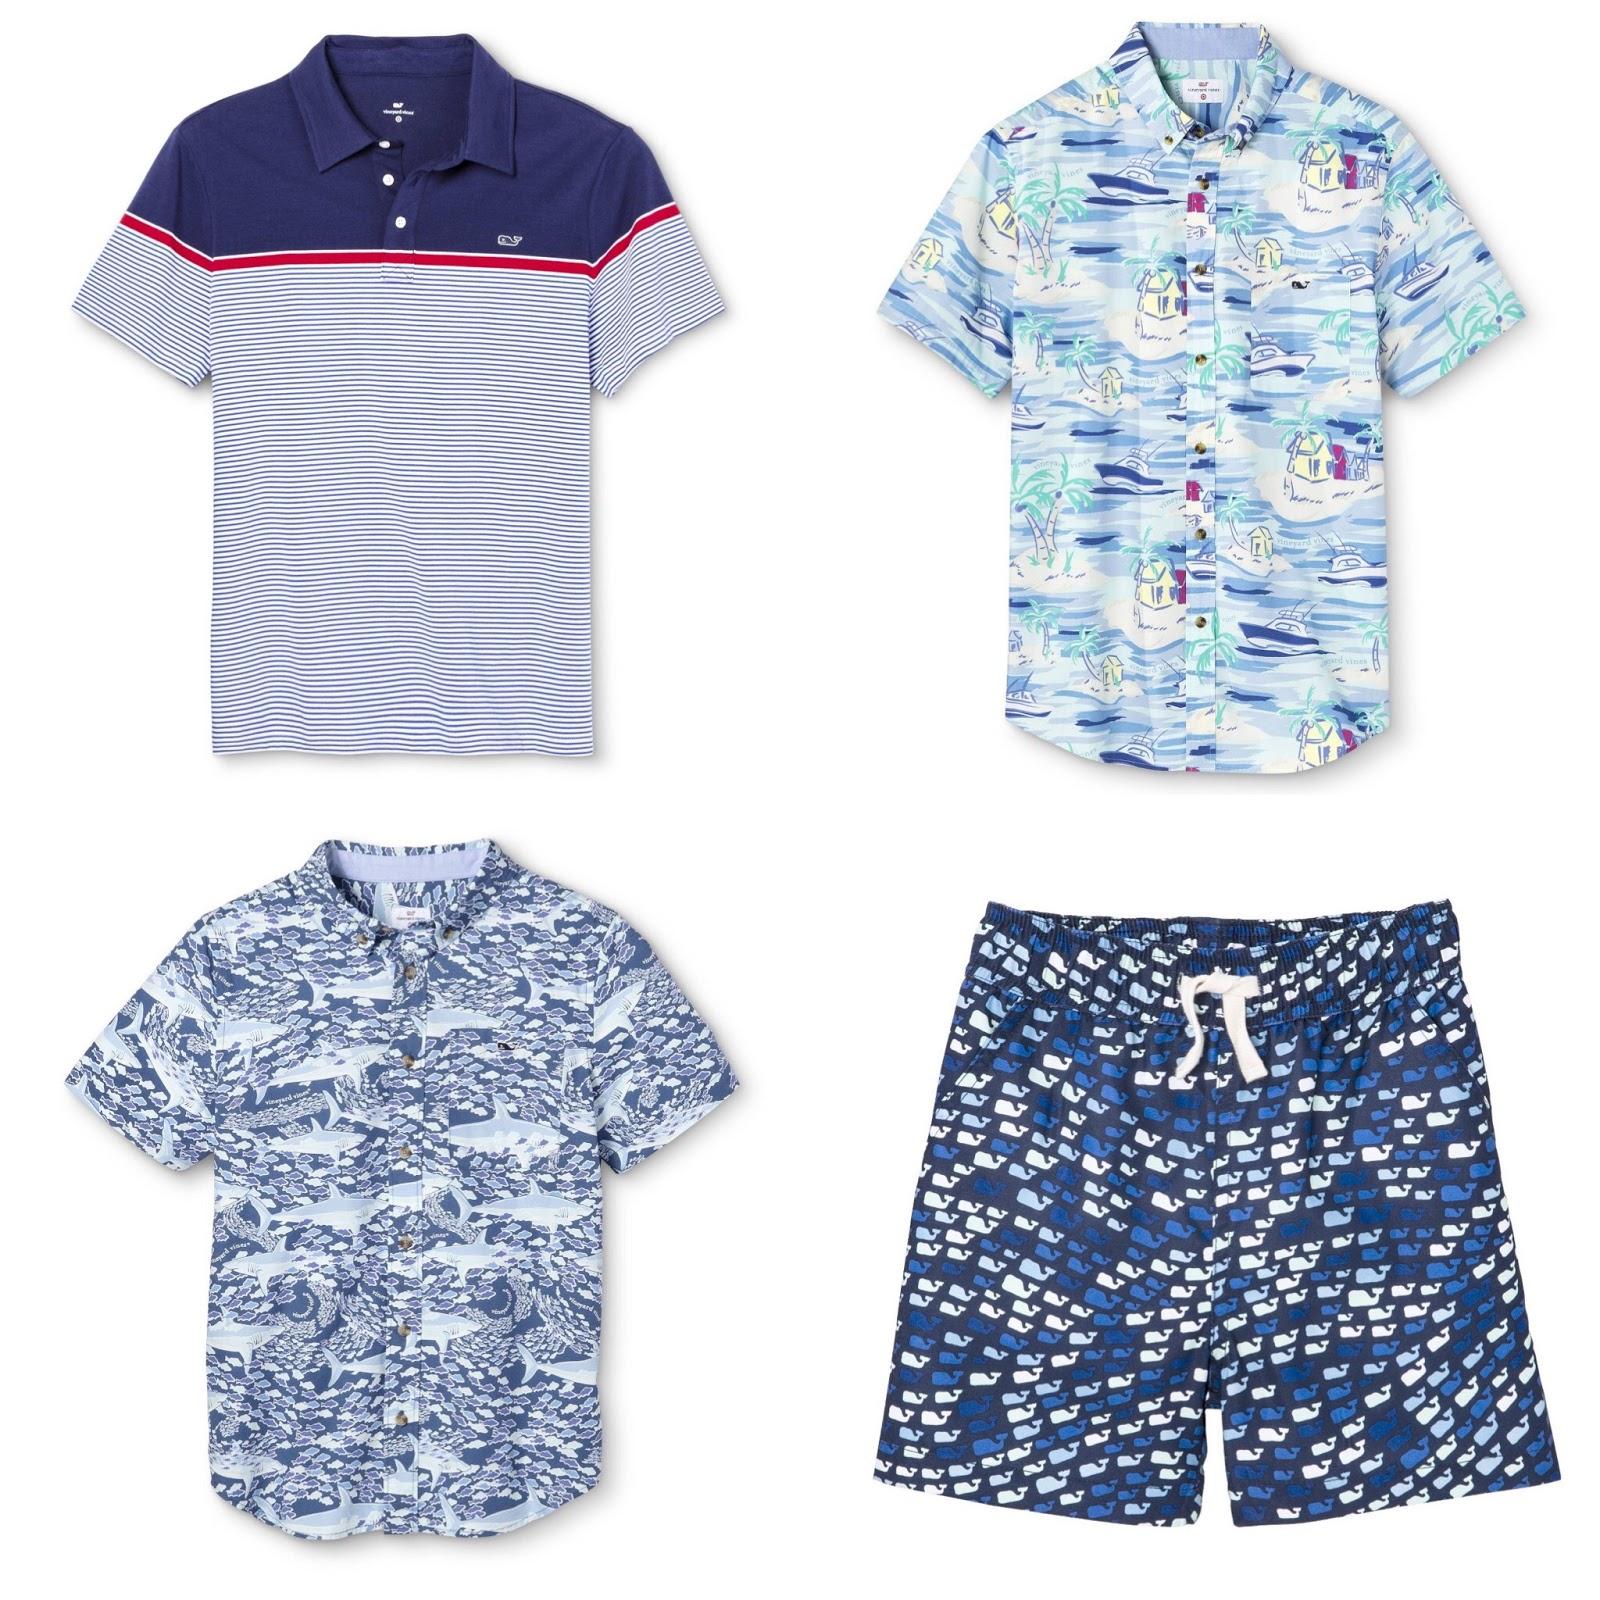 Vineyard Vines Target Boys School of Sharks Woven Button Down Shirt Short Sleeve